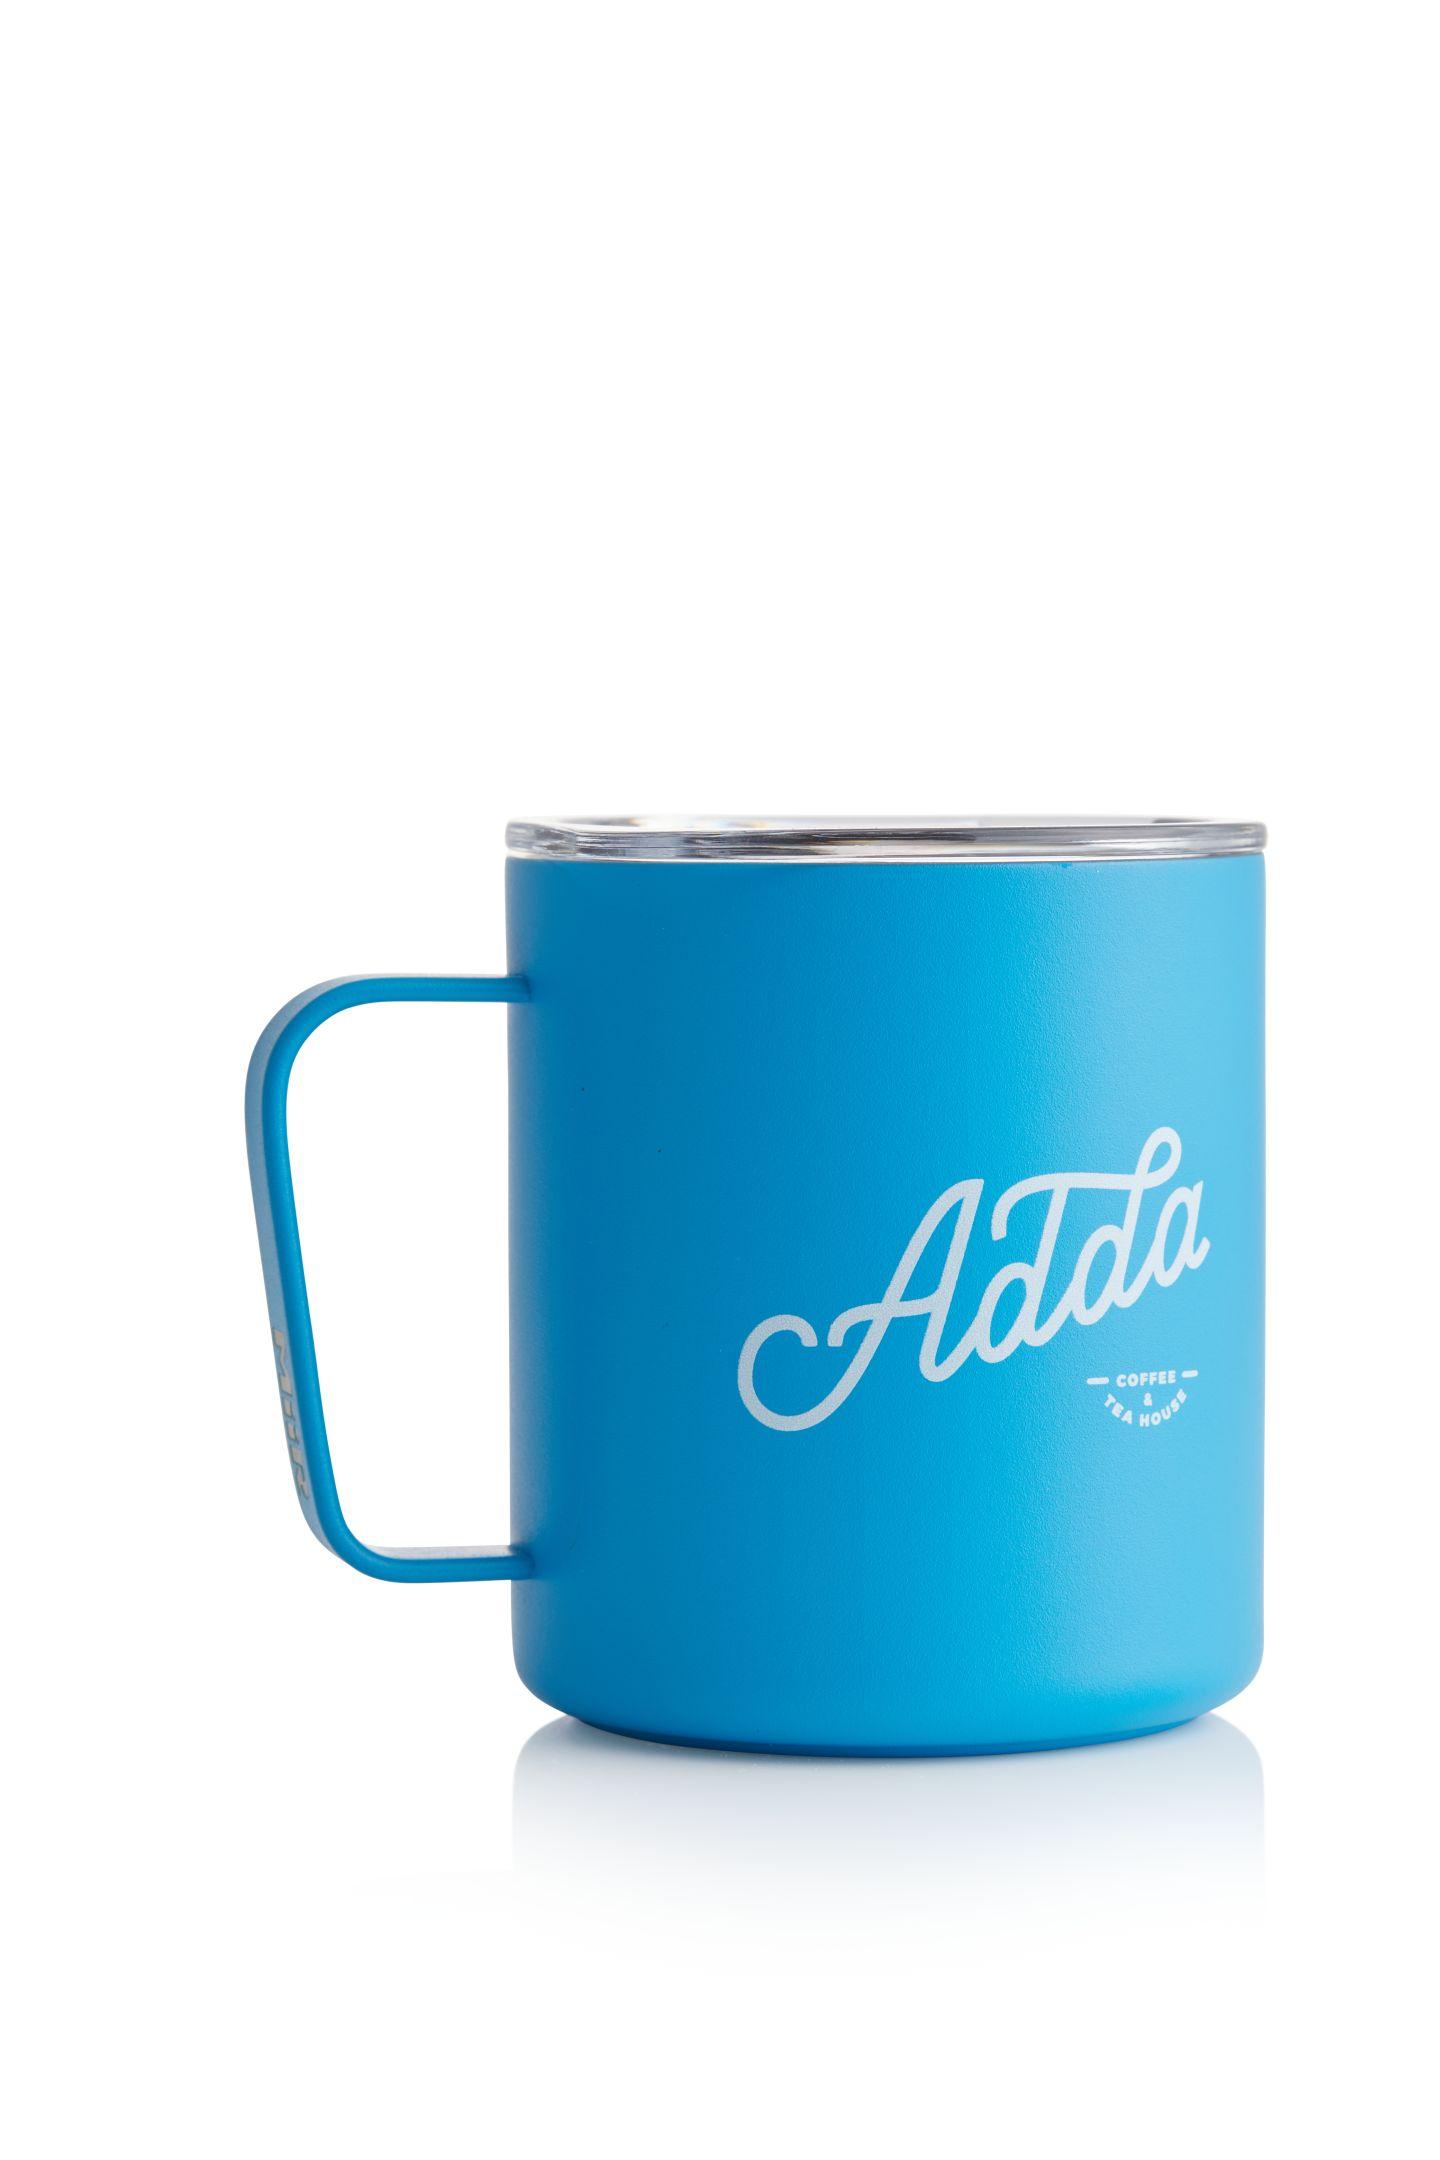 Adda x Miir Insulated Travel Mug